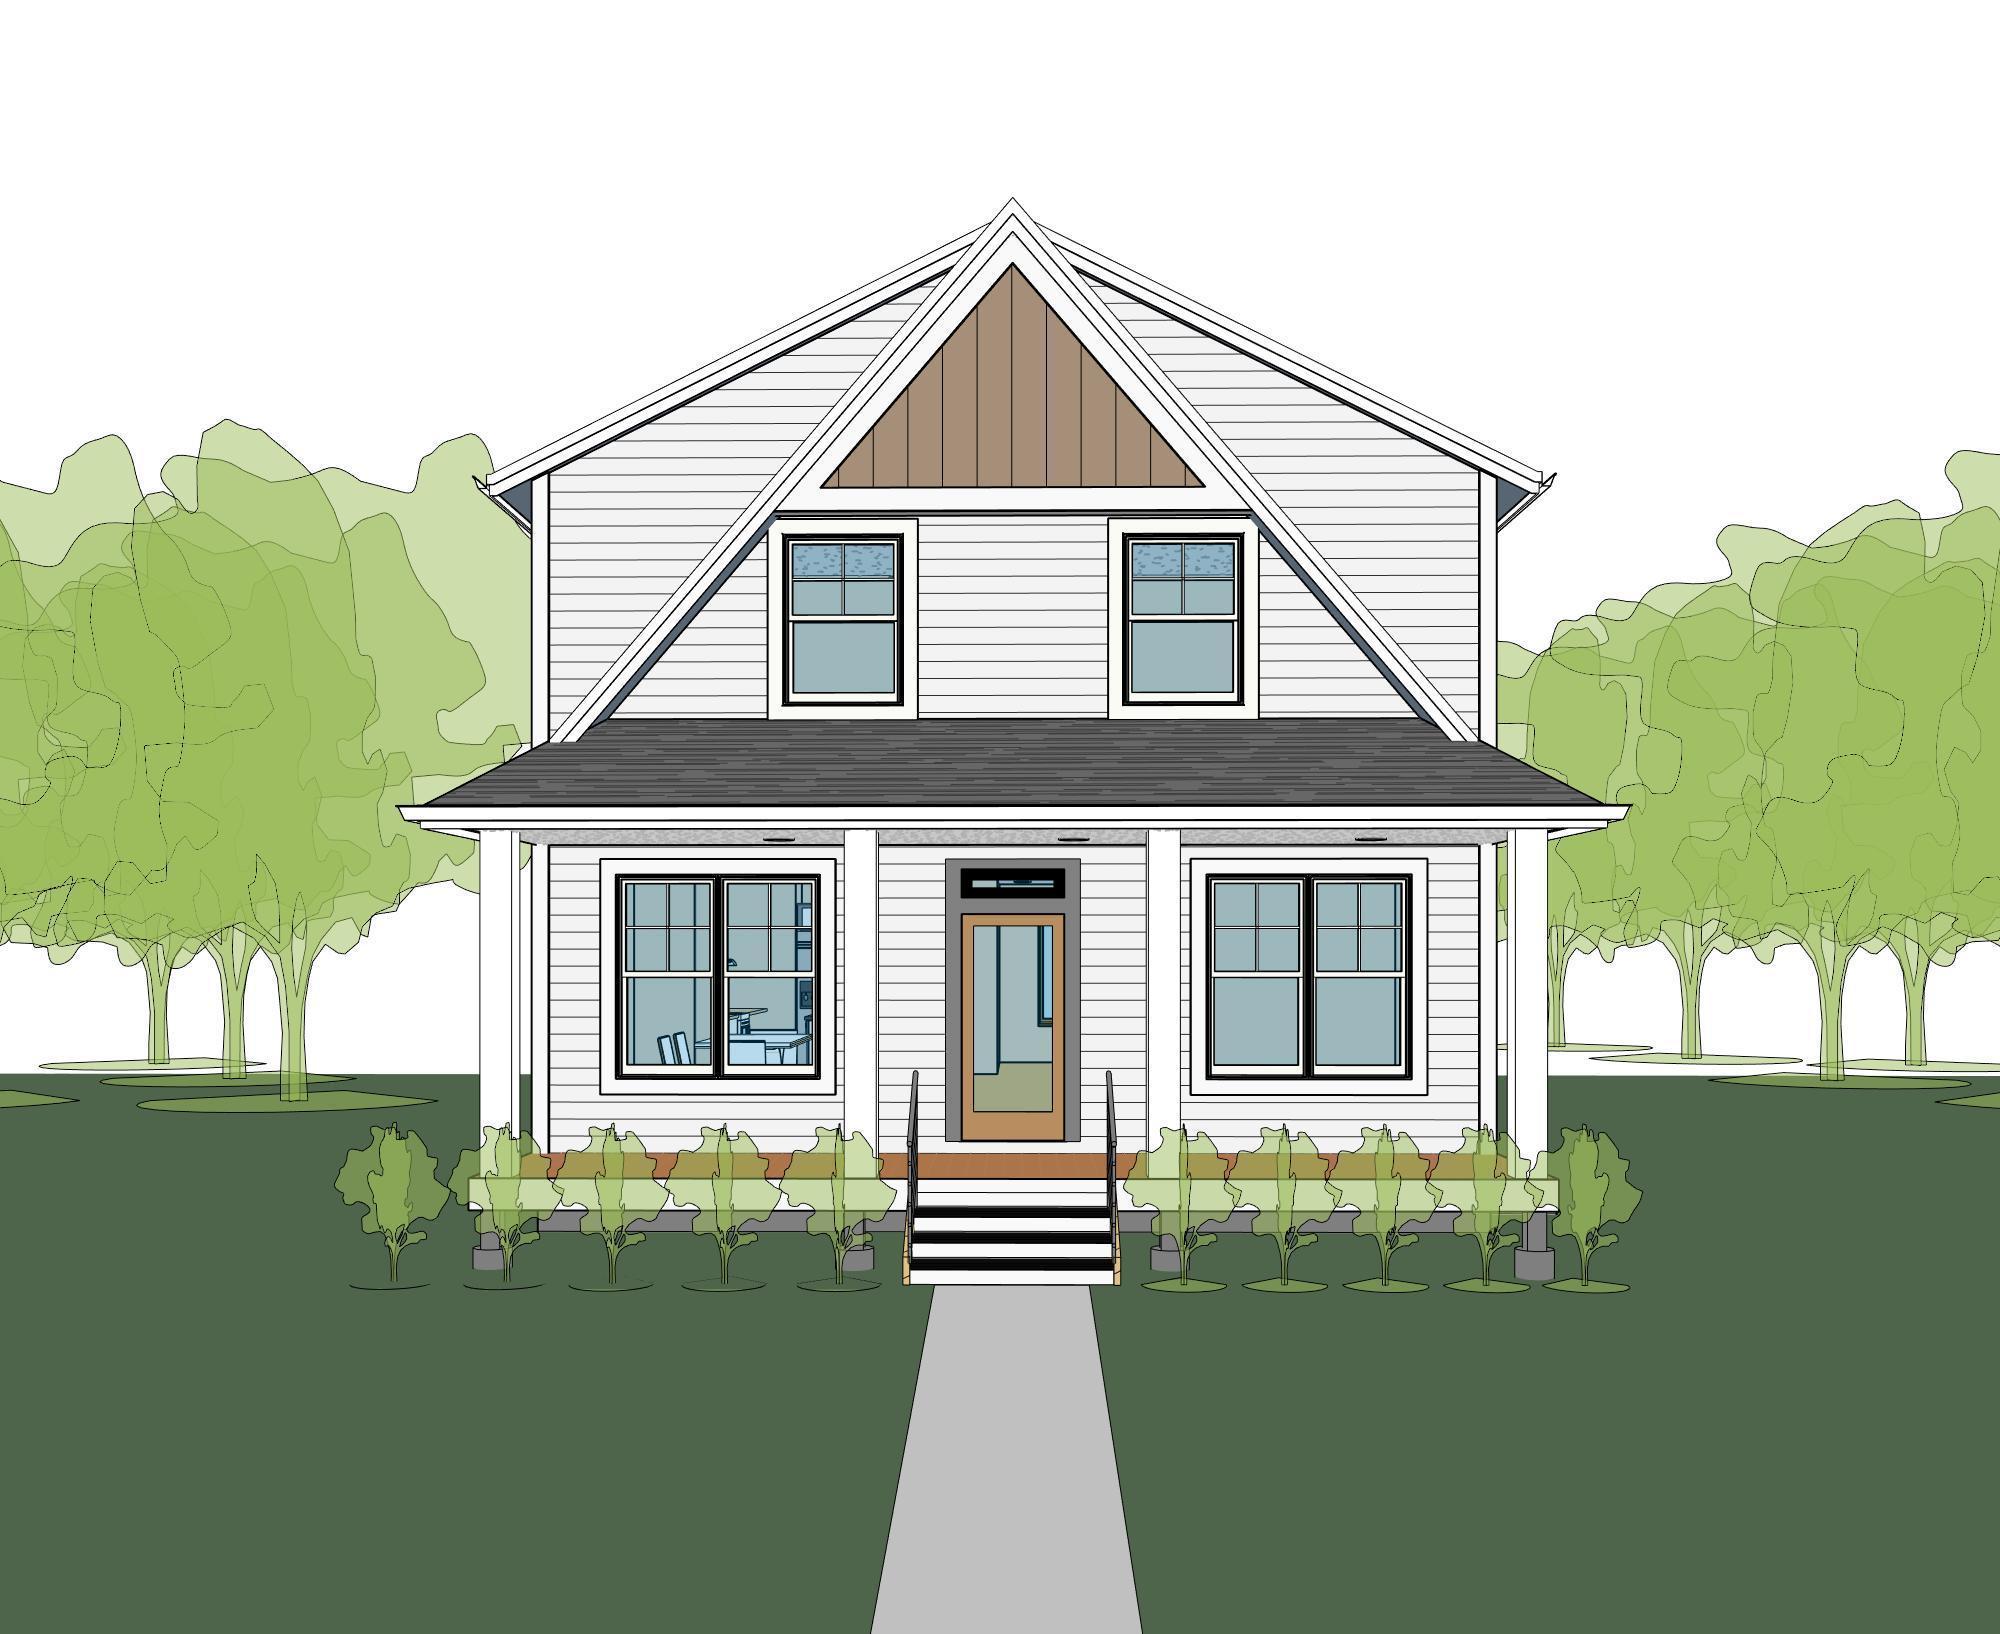 3132 37th Avenue S Property Photo - Minneapolis, MN real estate listing